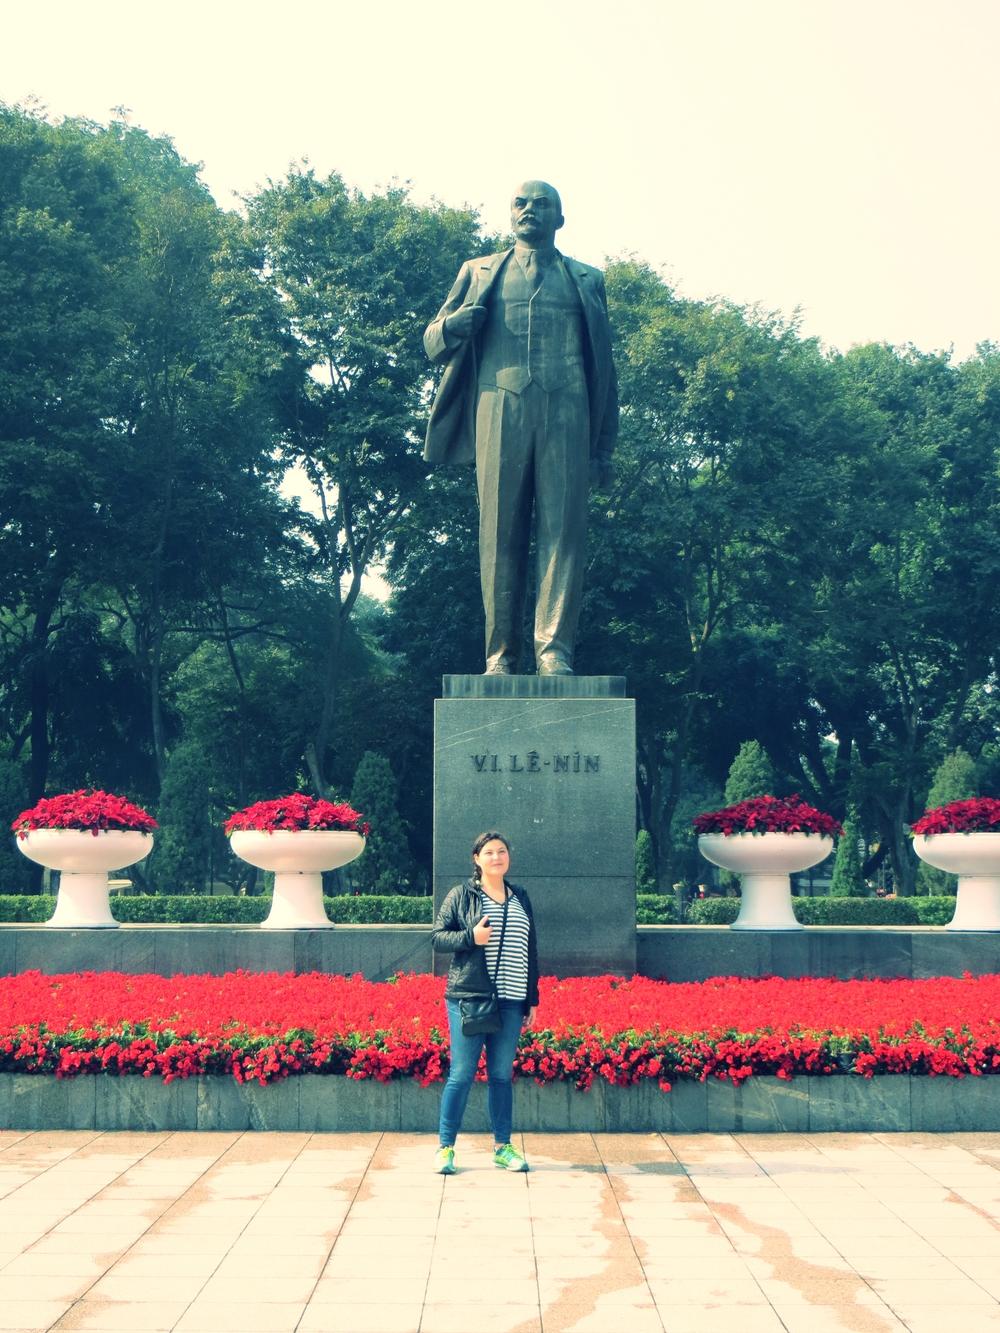 Bringing out my inner Lenin